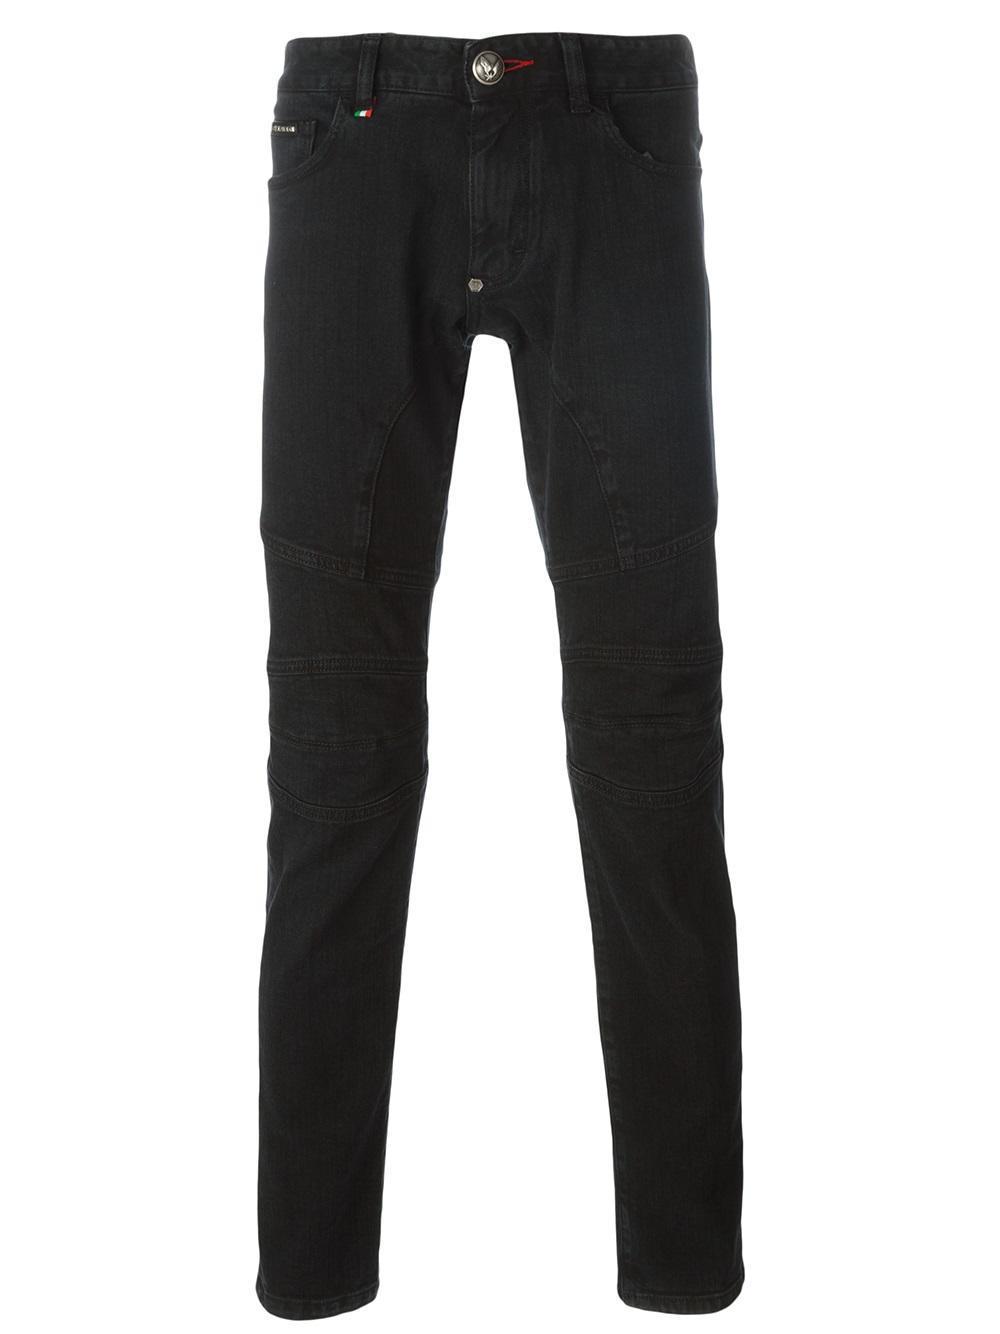 philipp plein biker jeans in black for men lyst. Black Bedroom Furniture Sets. Home Design Ideas